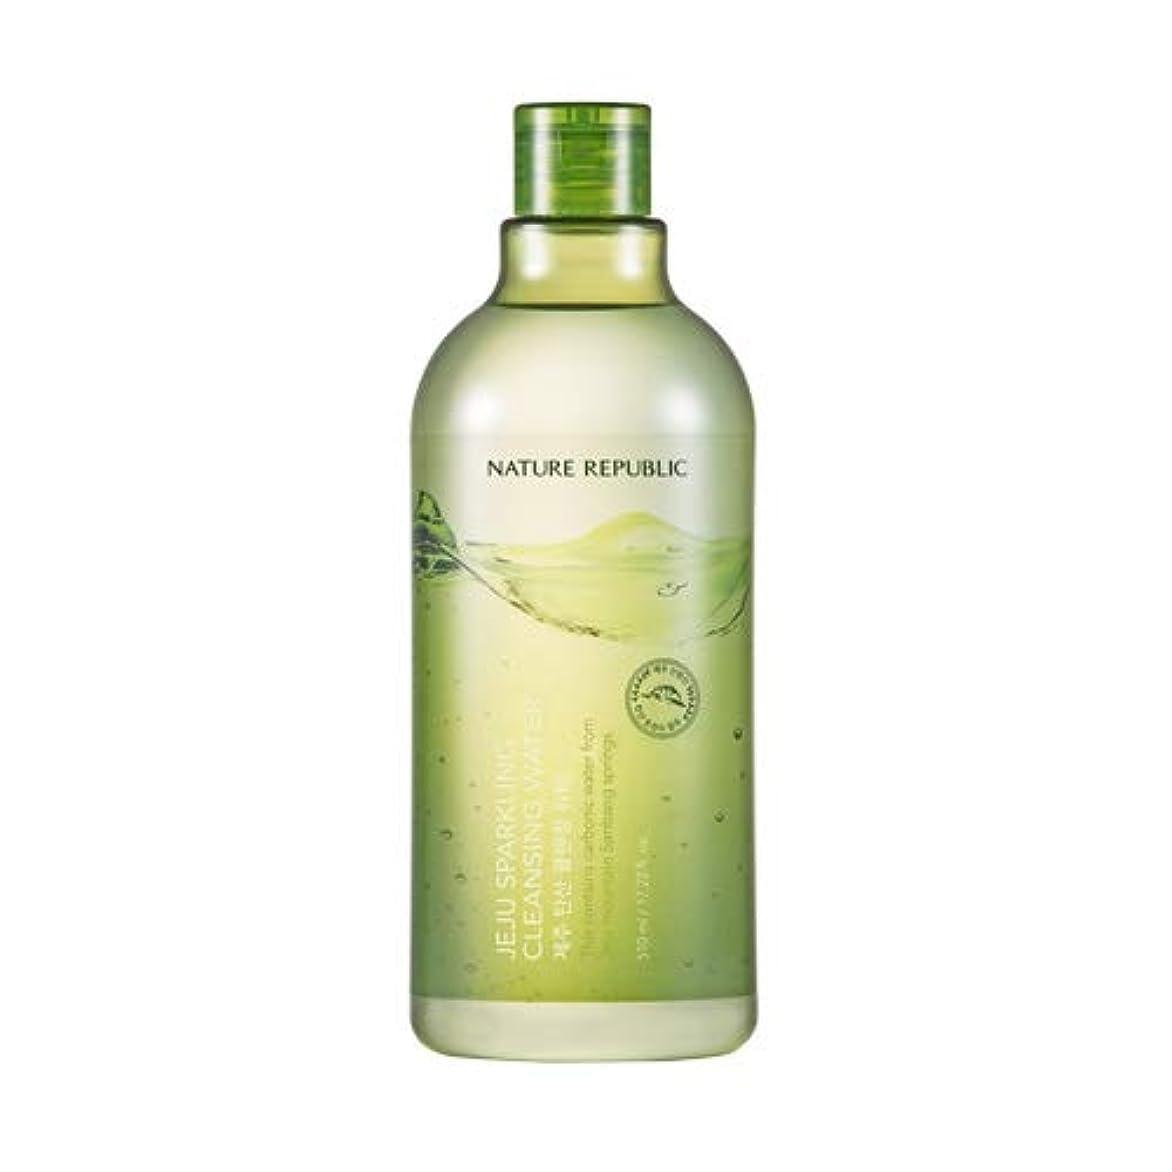 Nature republic Jeju Sparkling(Carbonic) Cleansing Water ネイチャーリパブリック済州炭酸クレンジングウォーター 510ml [並行輸入品]